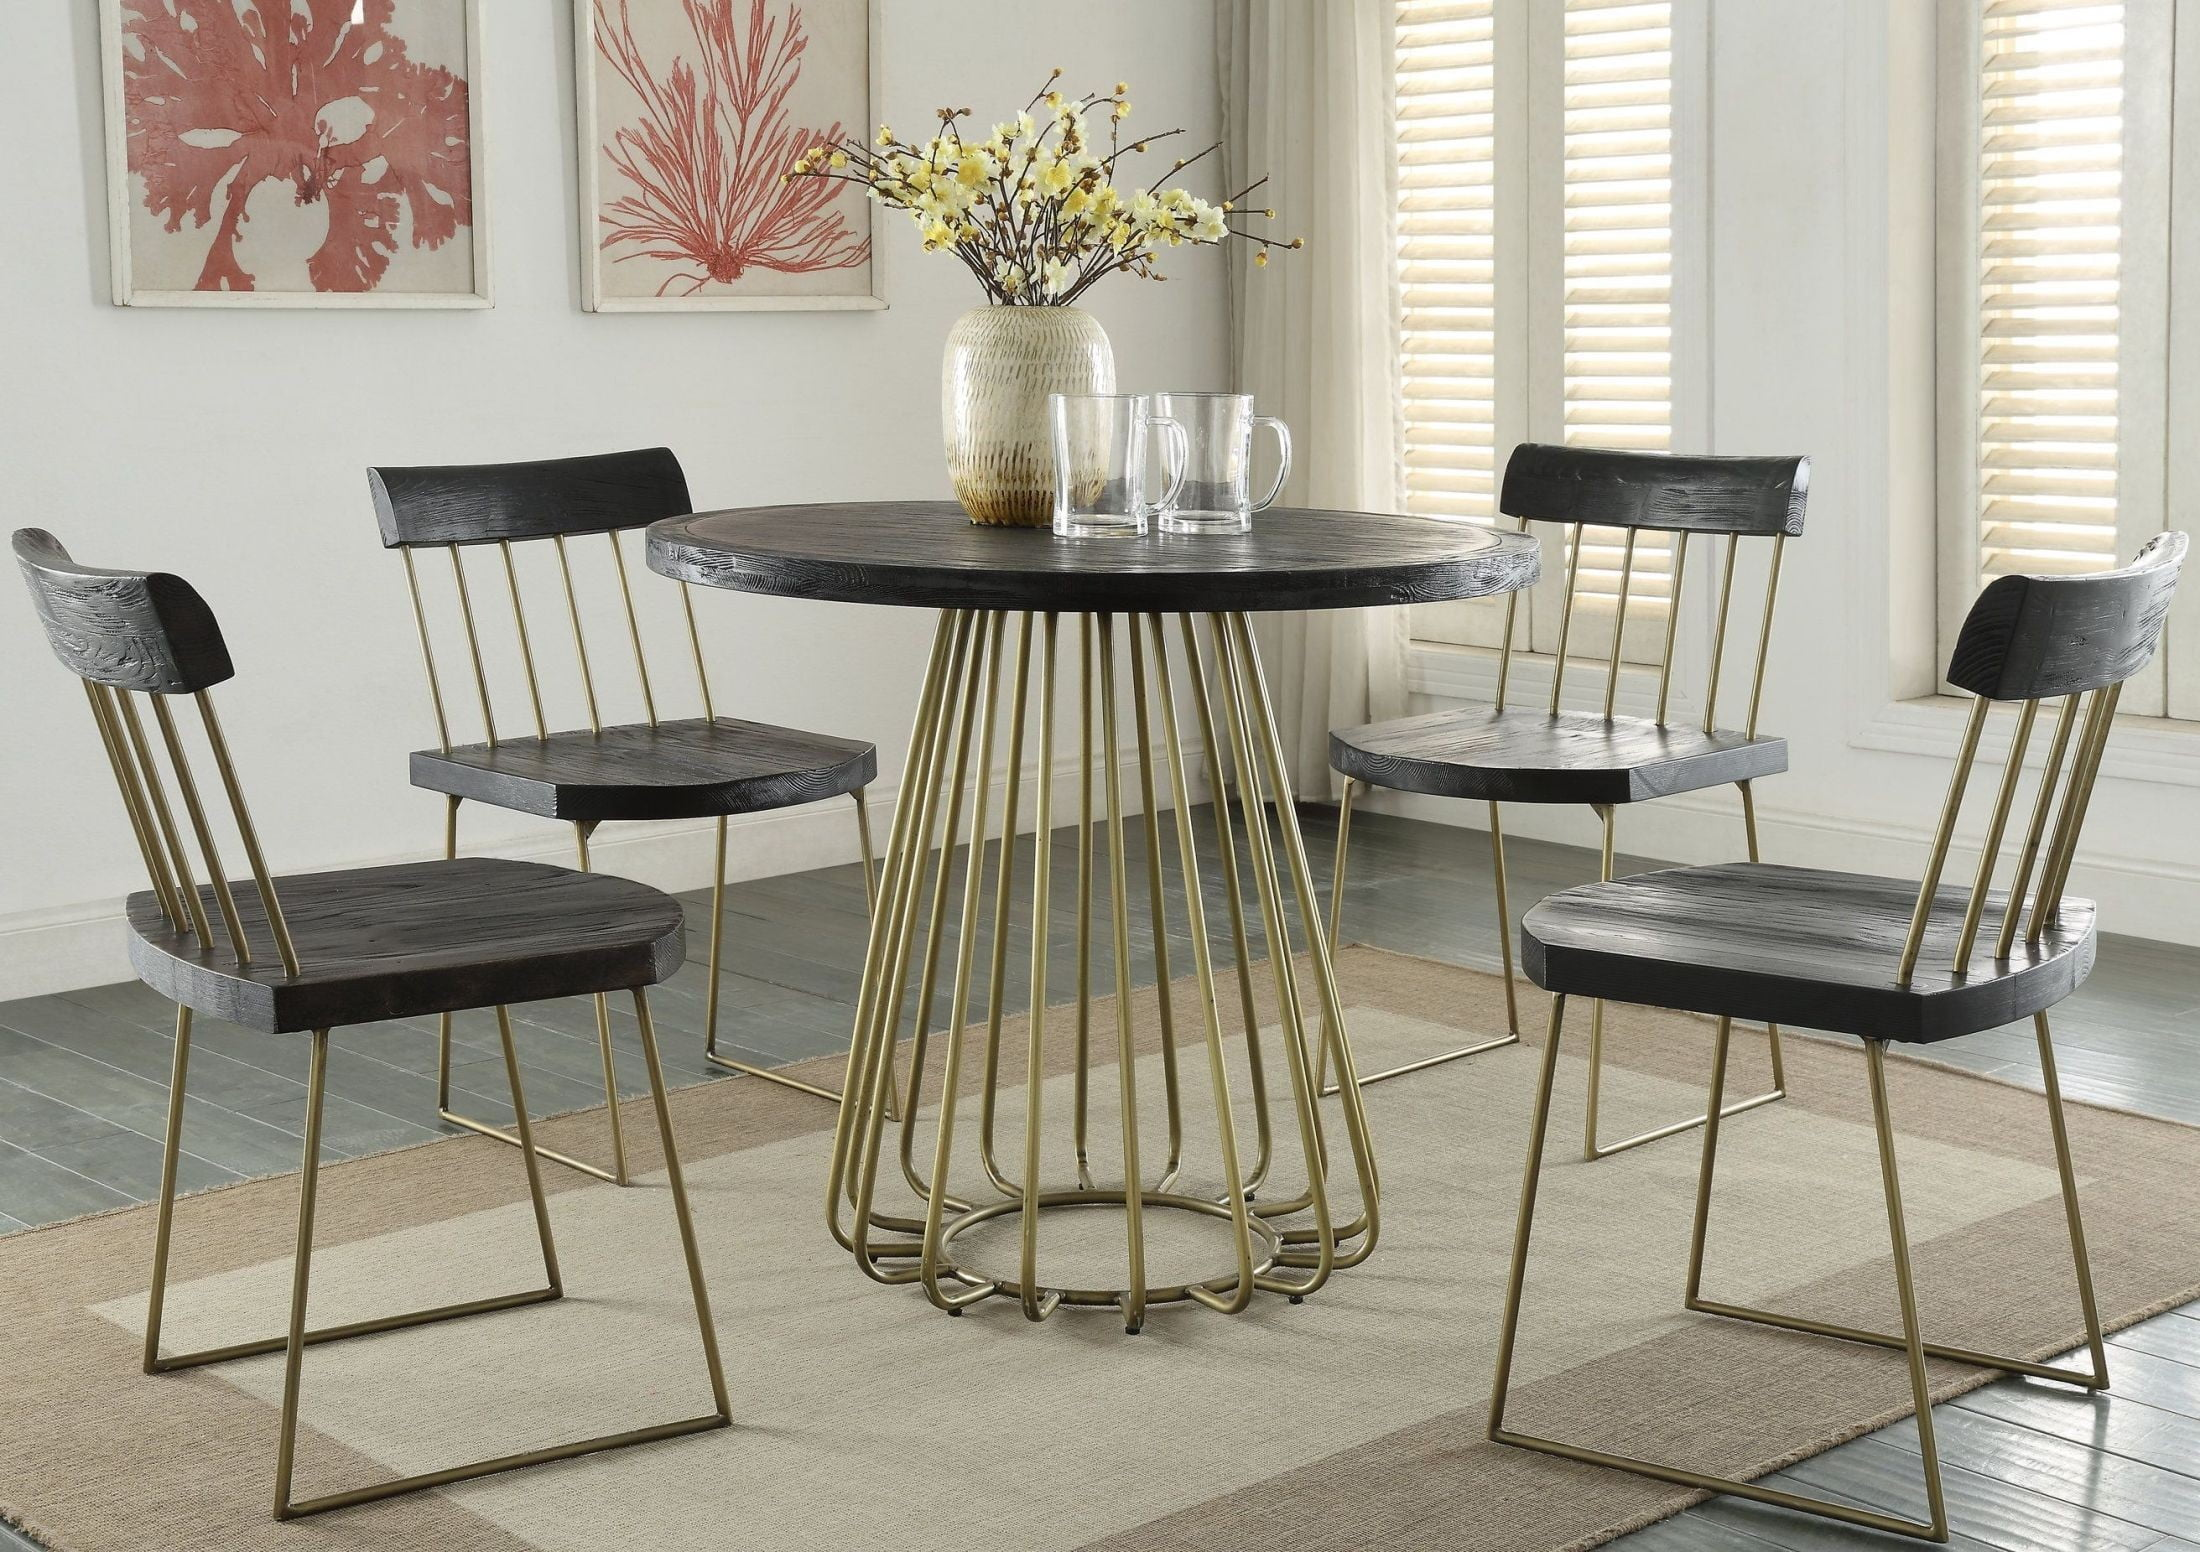 madrid pine round dining room set g5480 tov furniture 8 seater oregon pine dining room set pretoria north